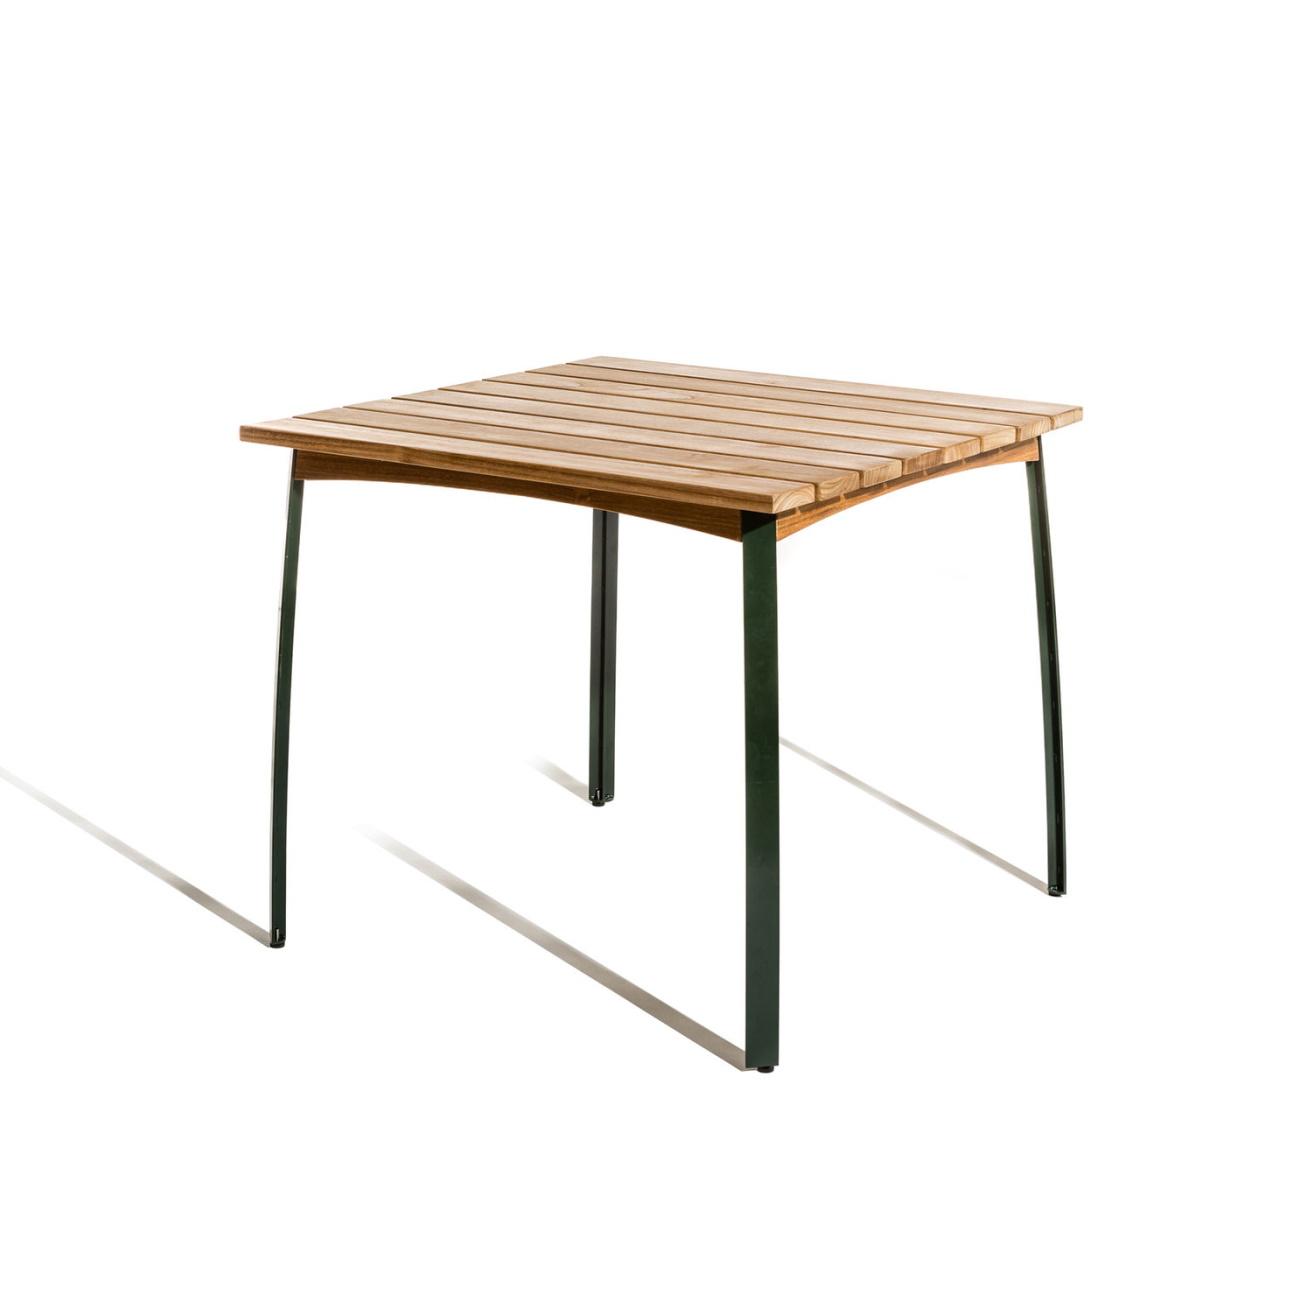 Kerteminde teakbord 80 x 80 cm, Skargaarden